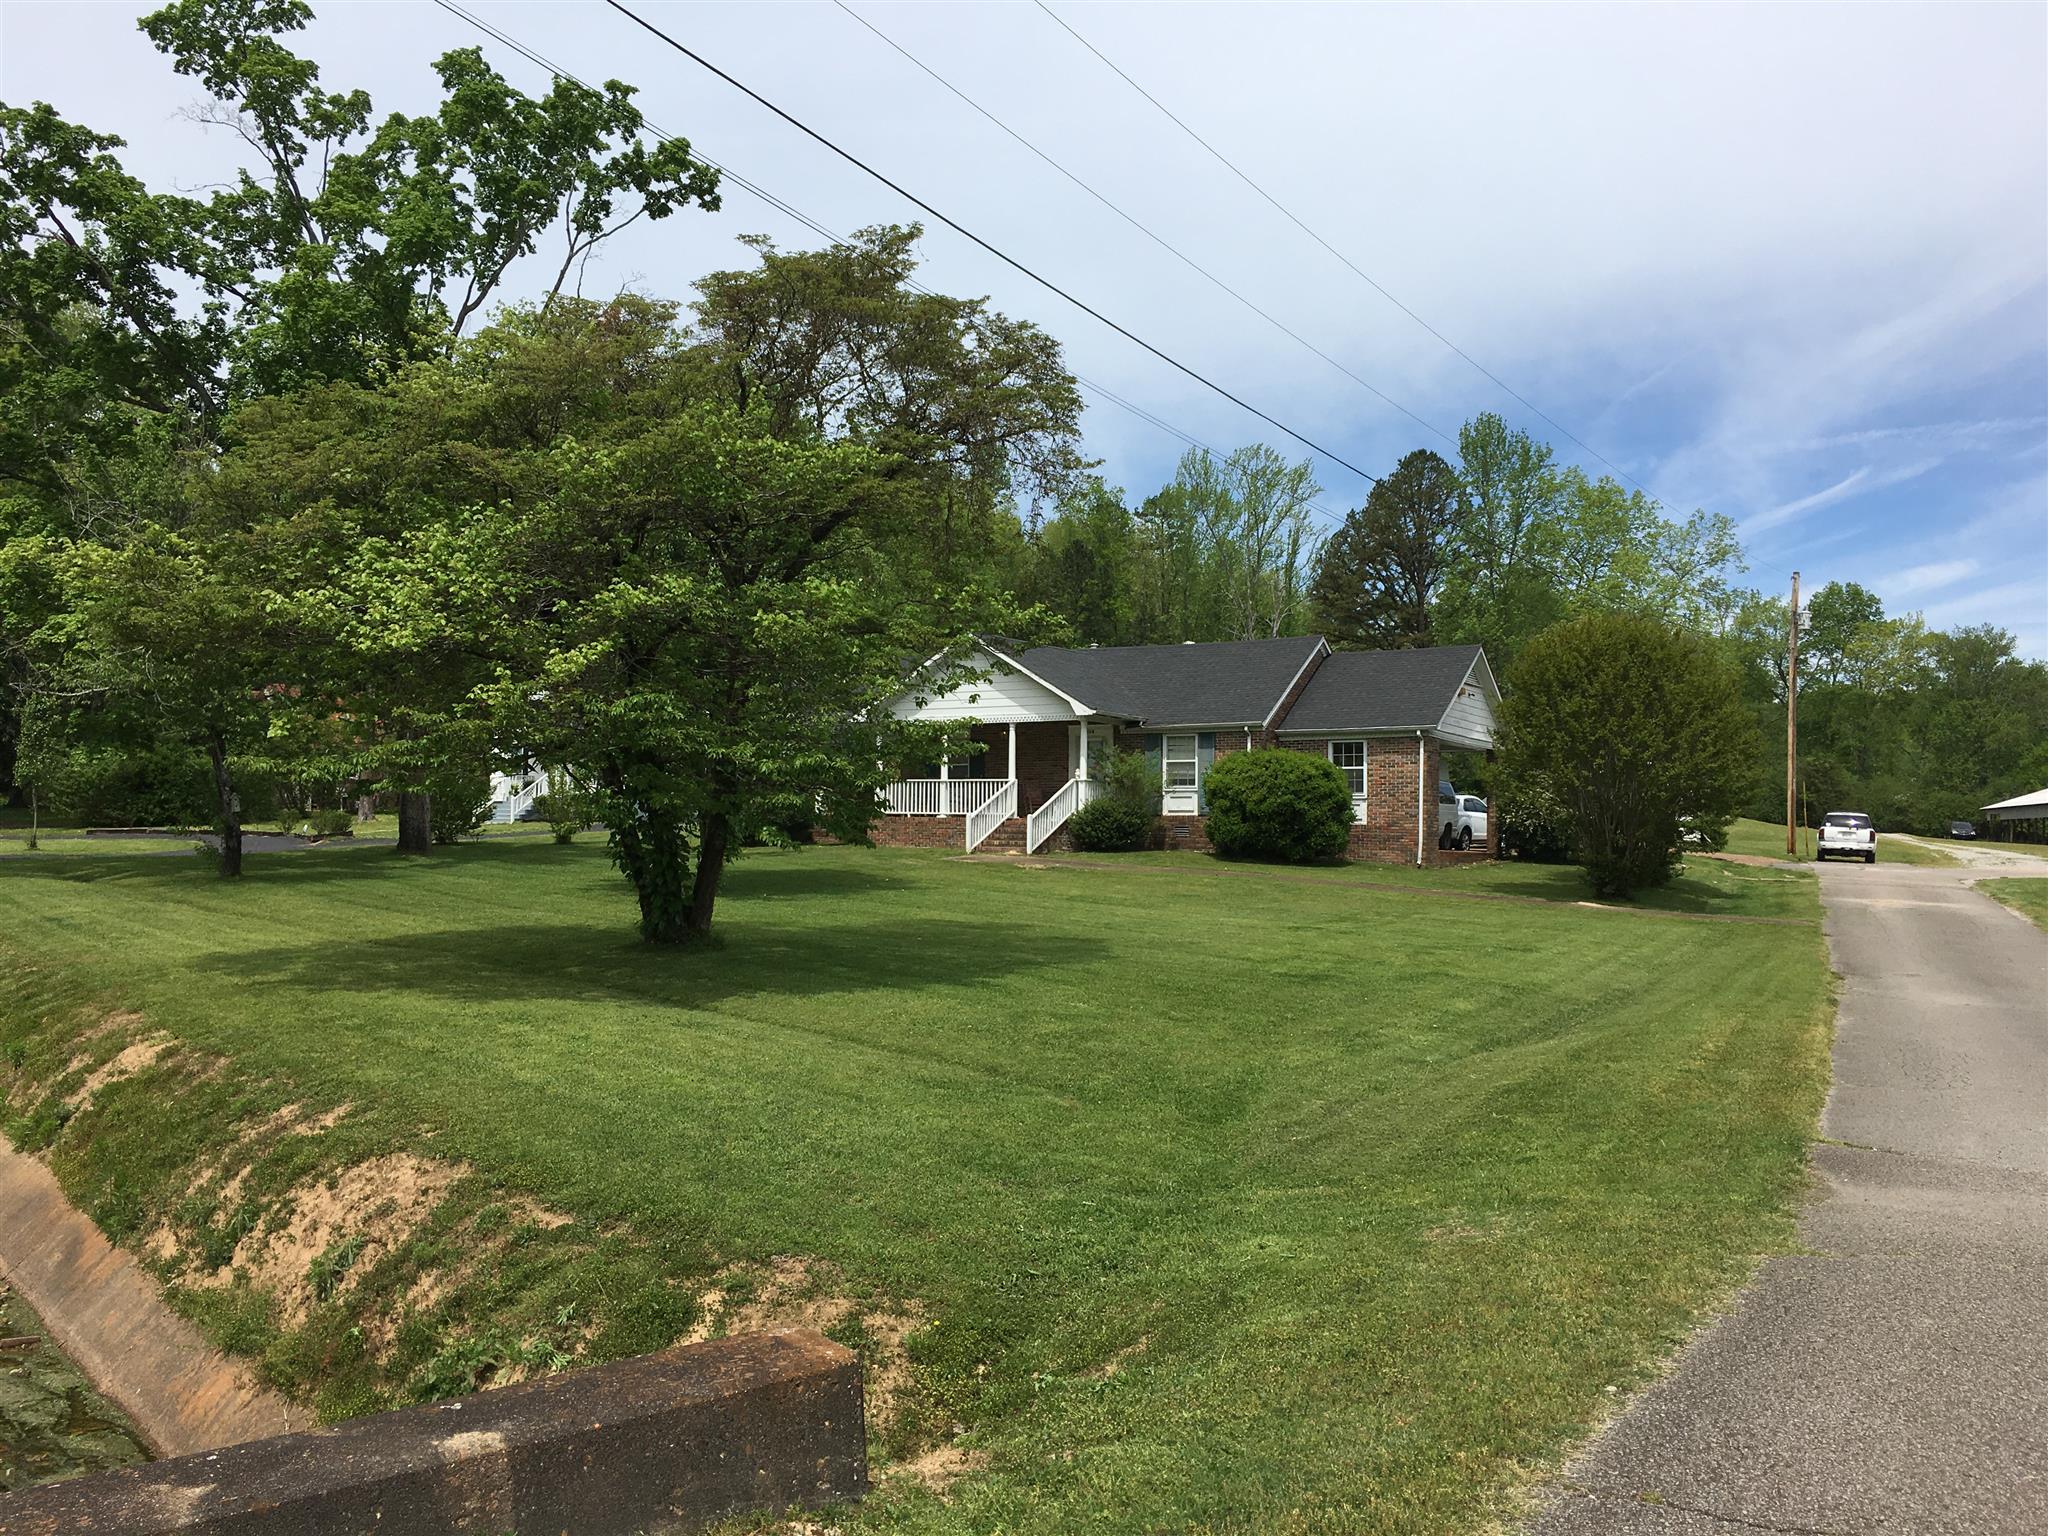 514 Hwy 64 West, W, Waynesboro, TN 38485 - Waynesboro, TN real estate listing